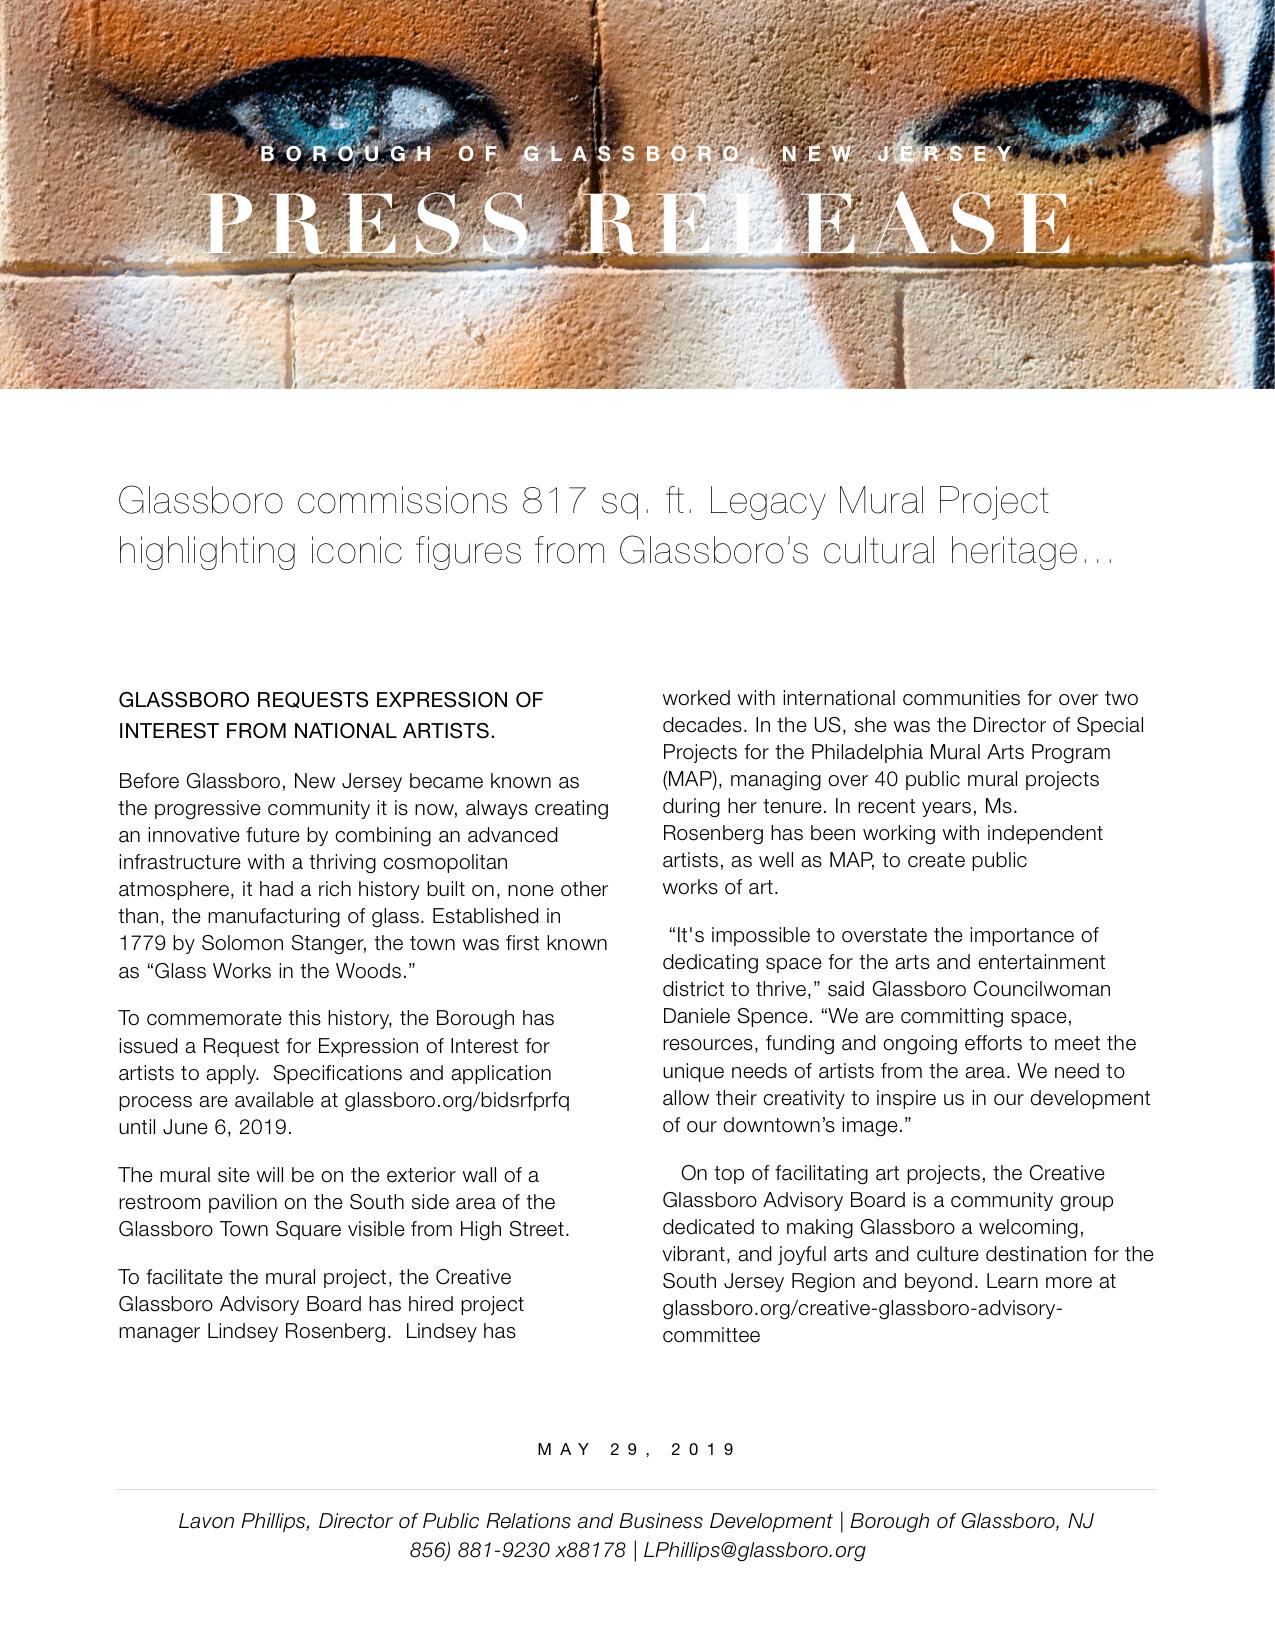 Glassboro NJ Press release TOWN SQUARE MURAL.jpeg